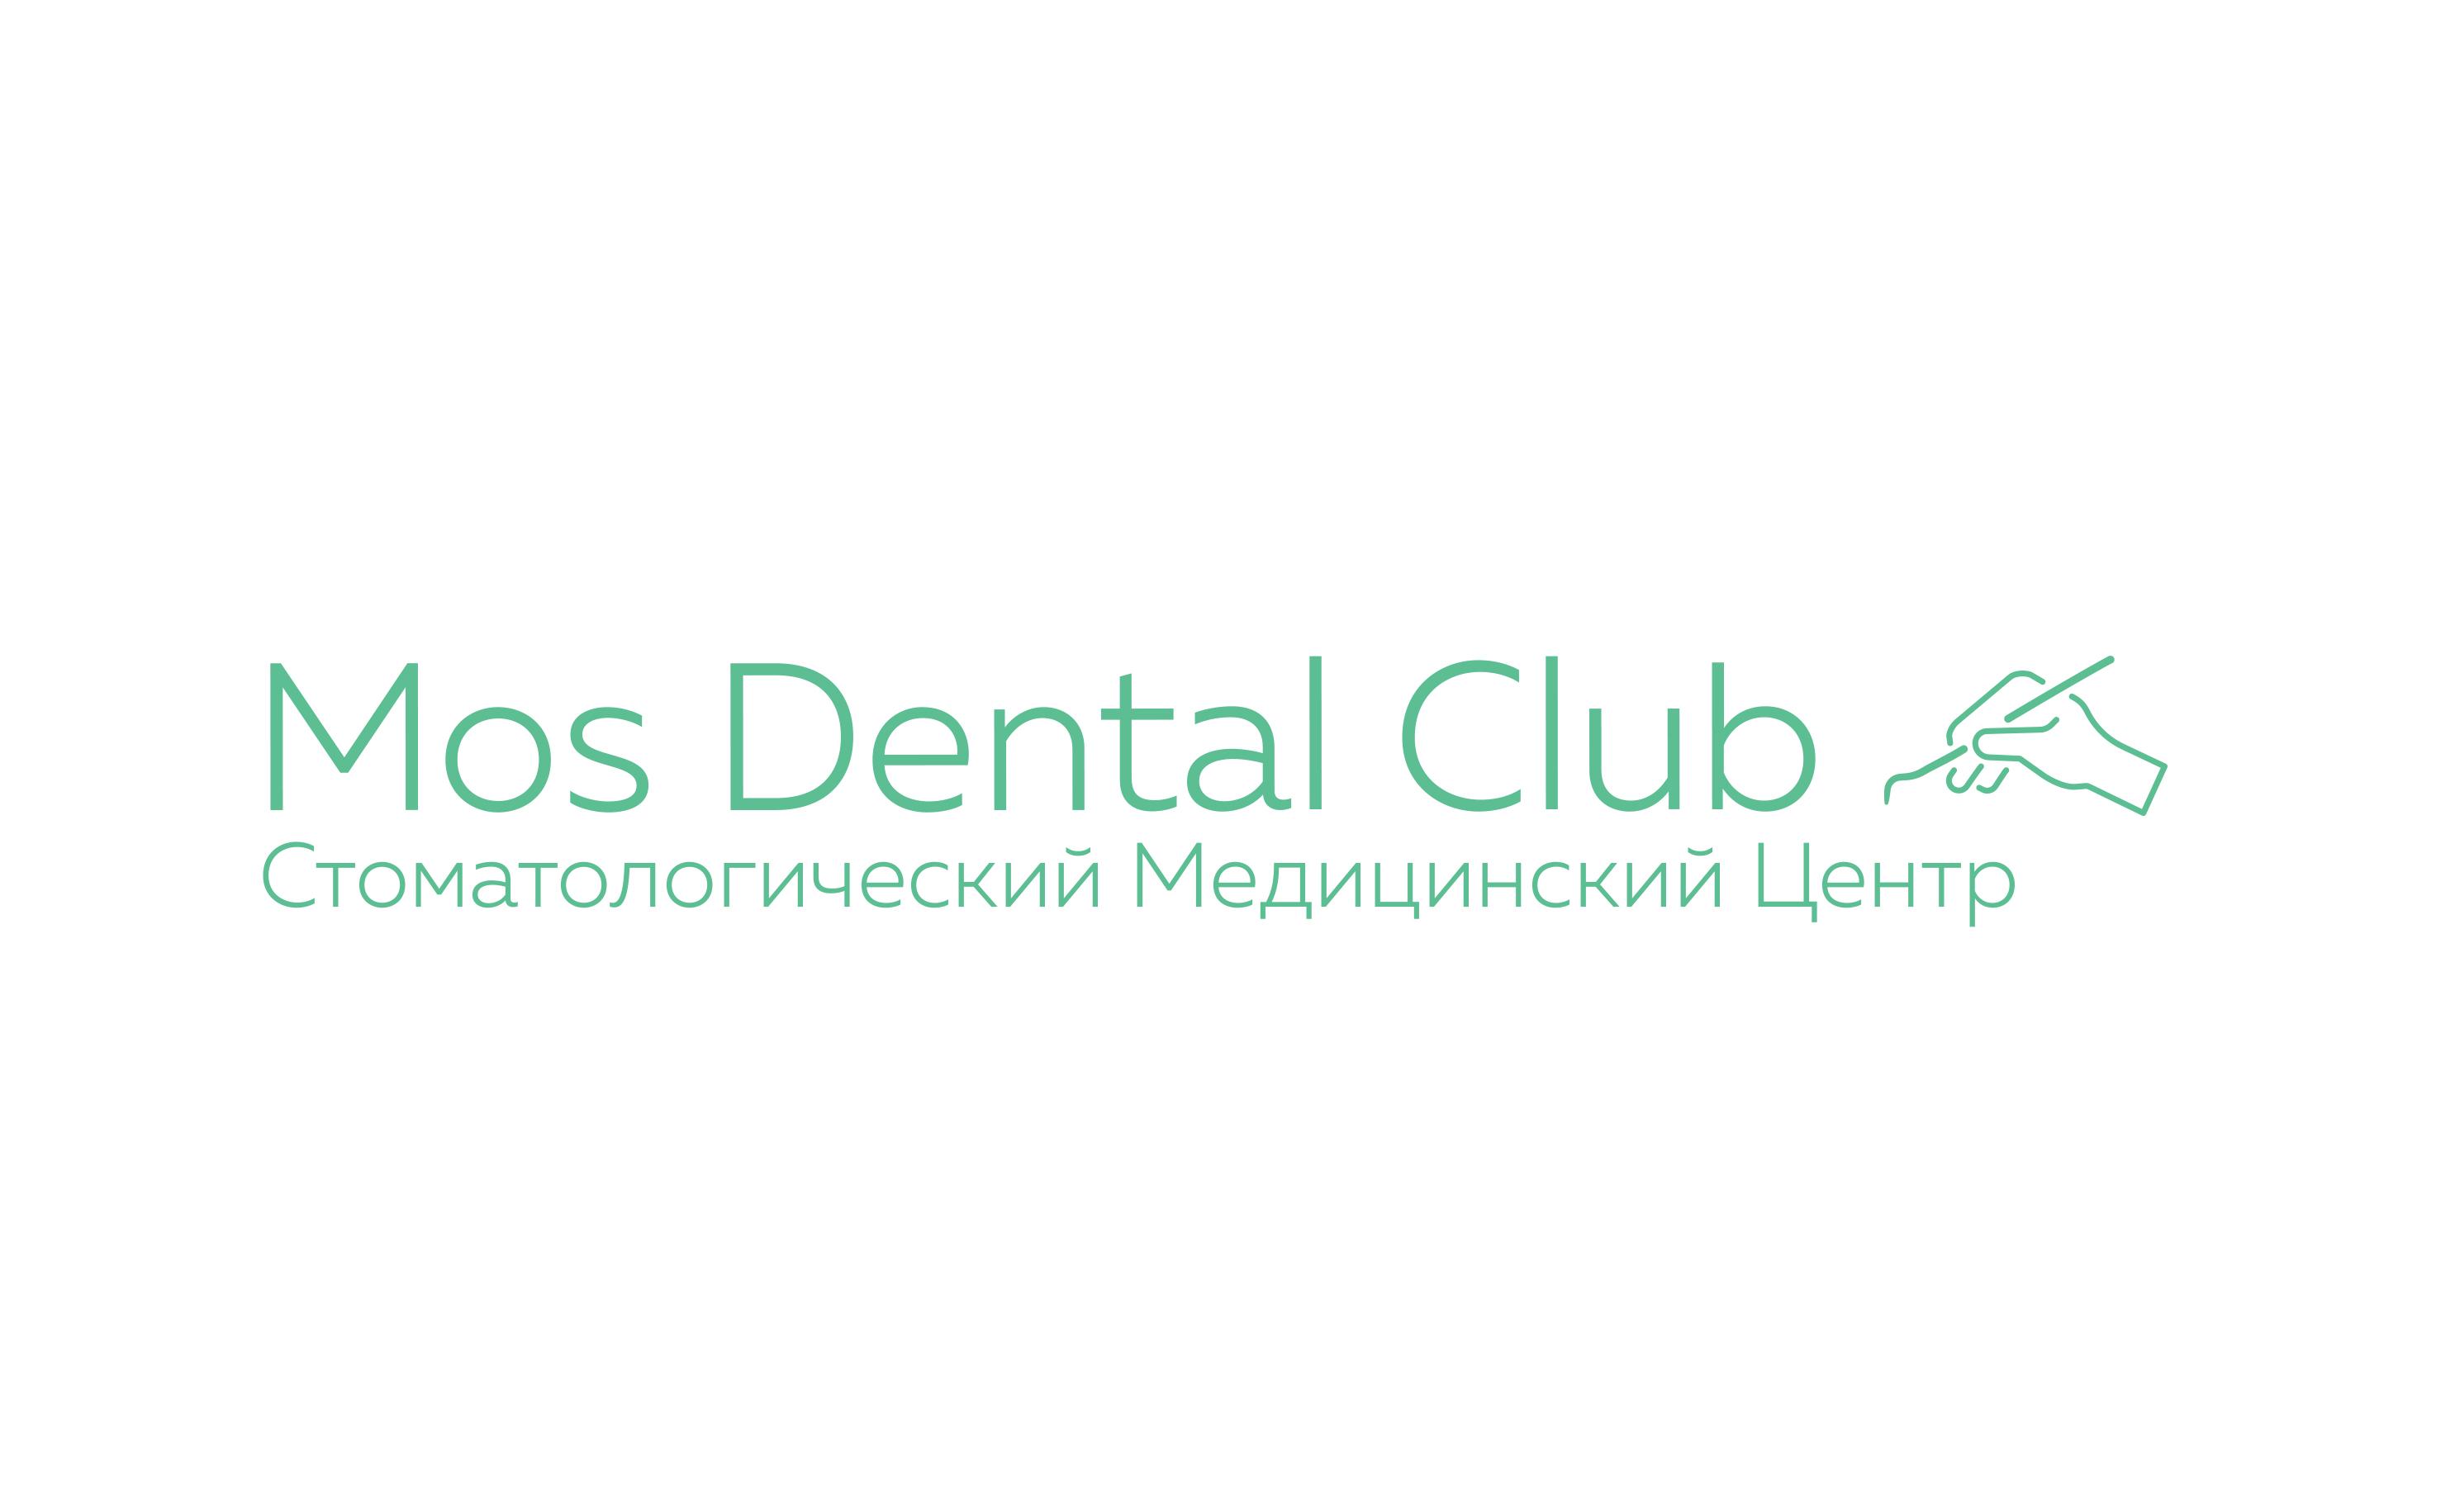 Разработка логотипа стоматологического медицинского центра фото f_1125e4bd8340fe57.jpg